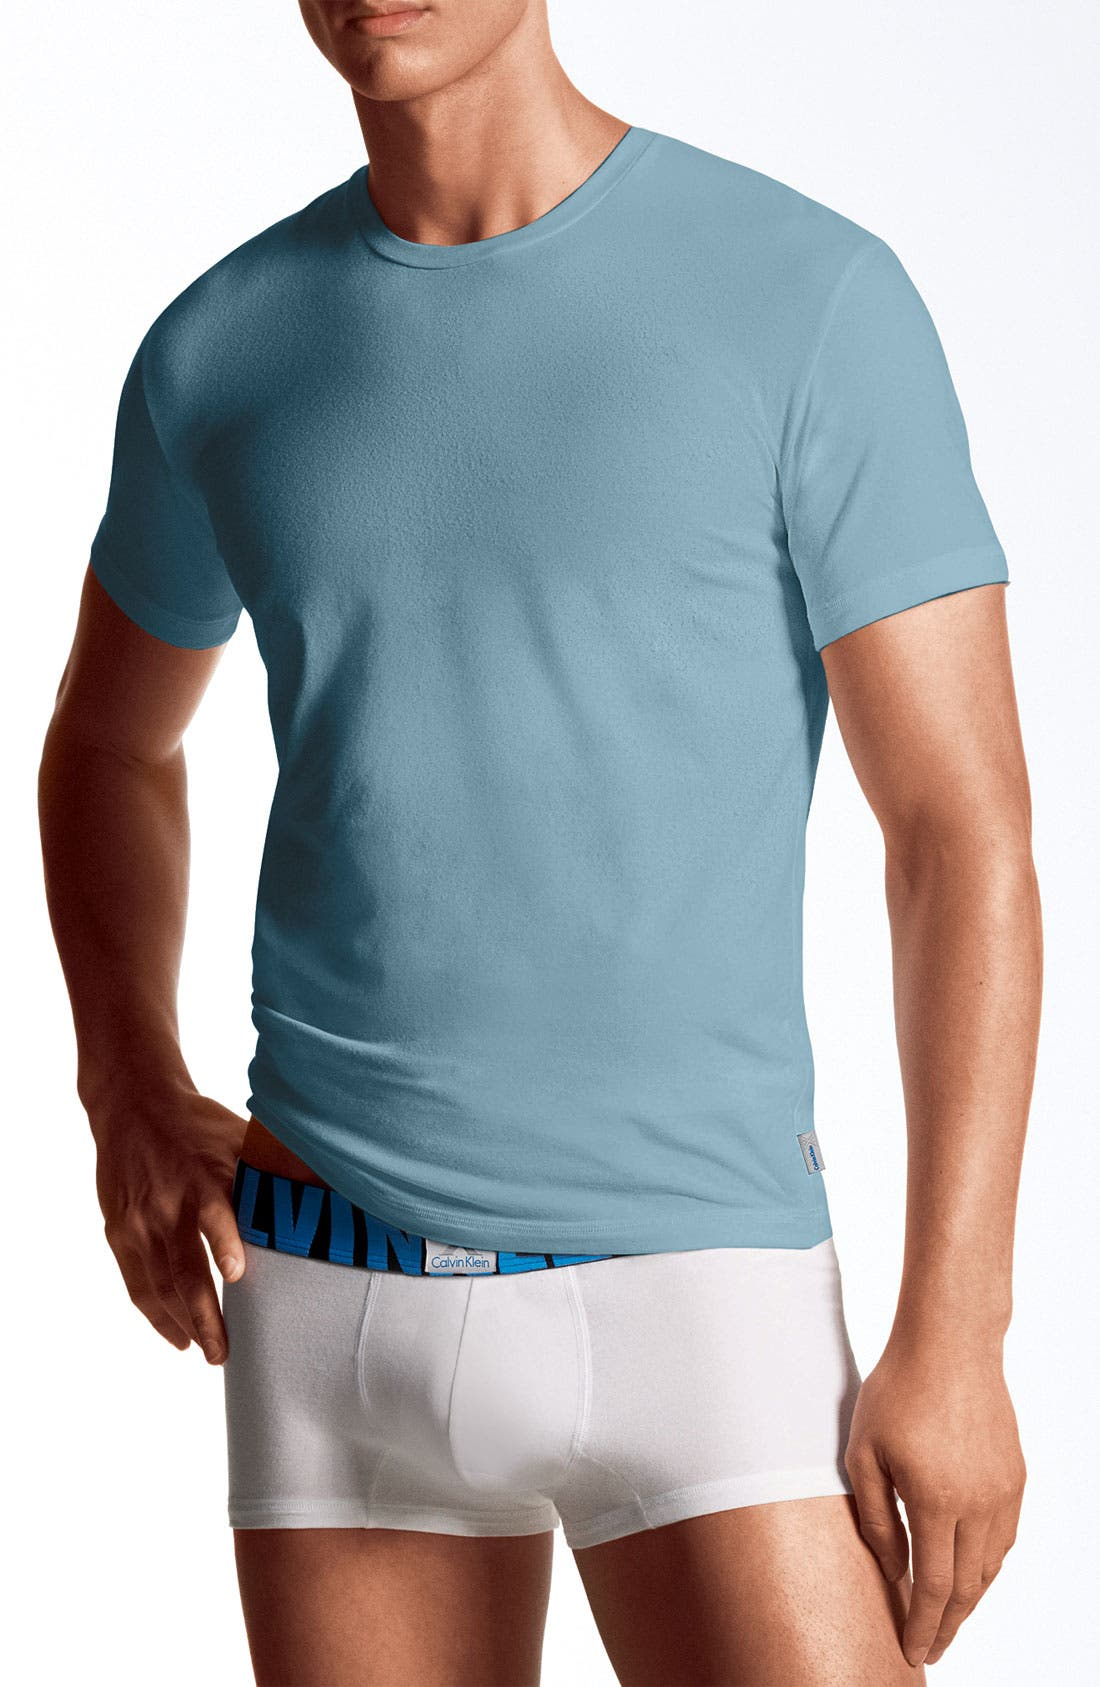 Main Image - Calvin Klein 'X' Stretch Cotton T-Shirt